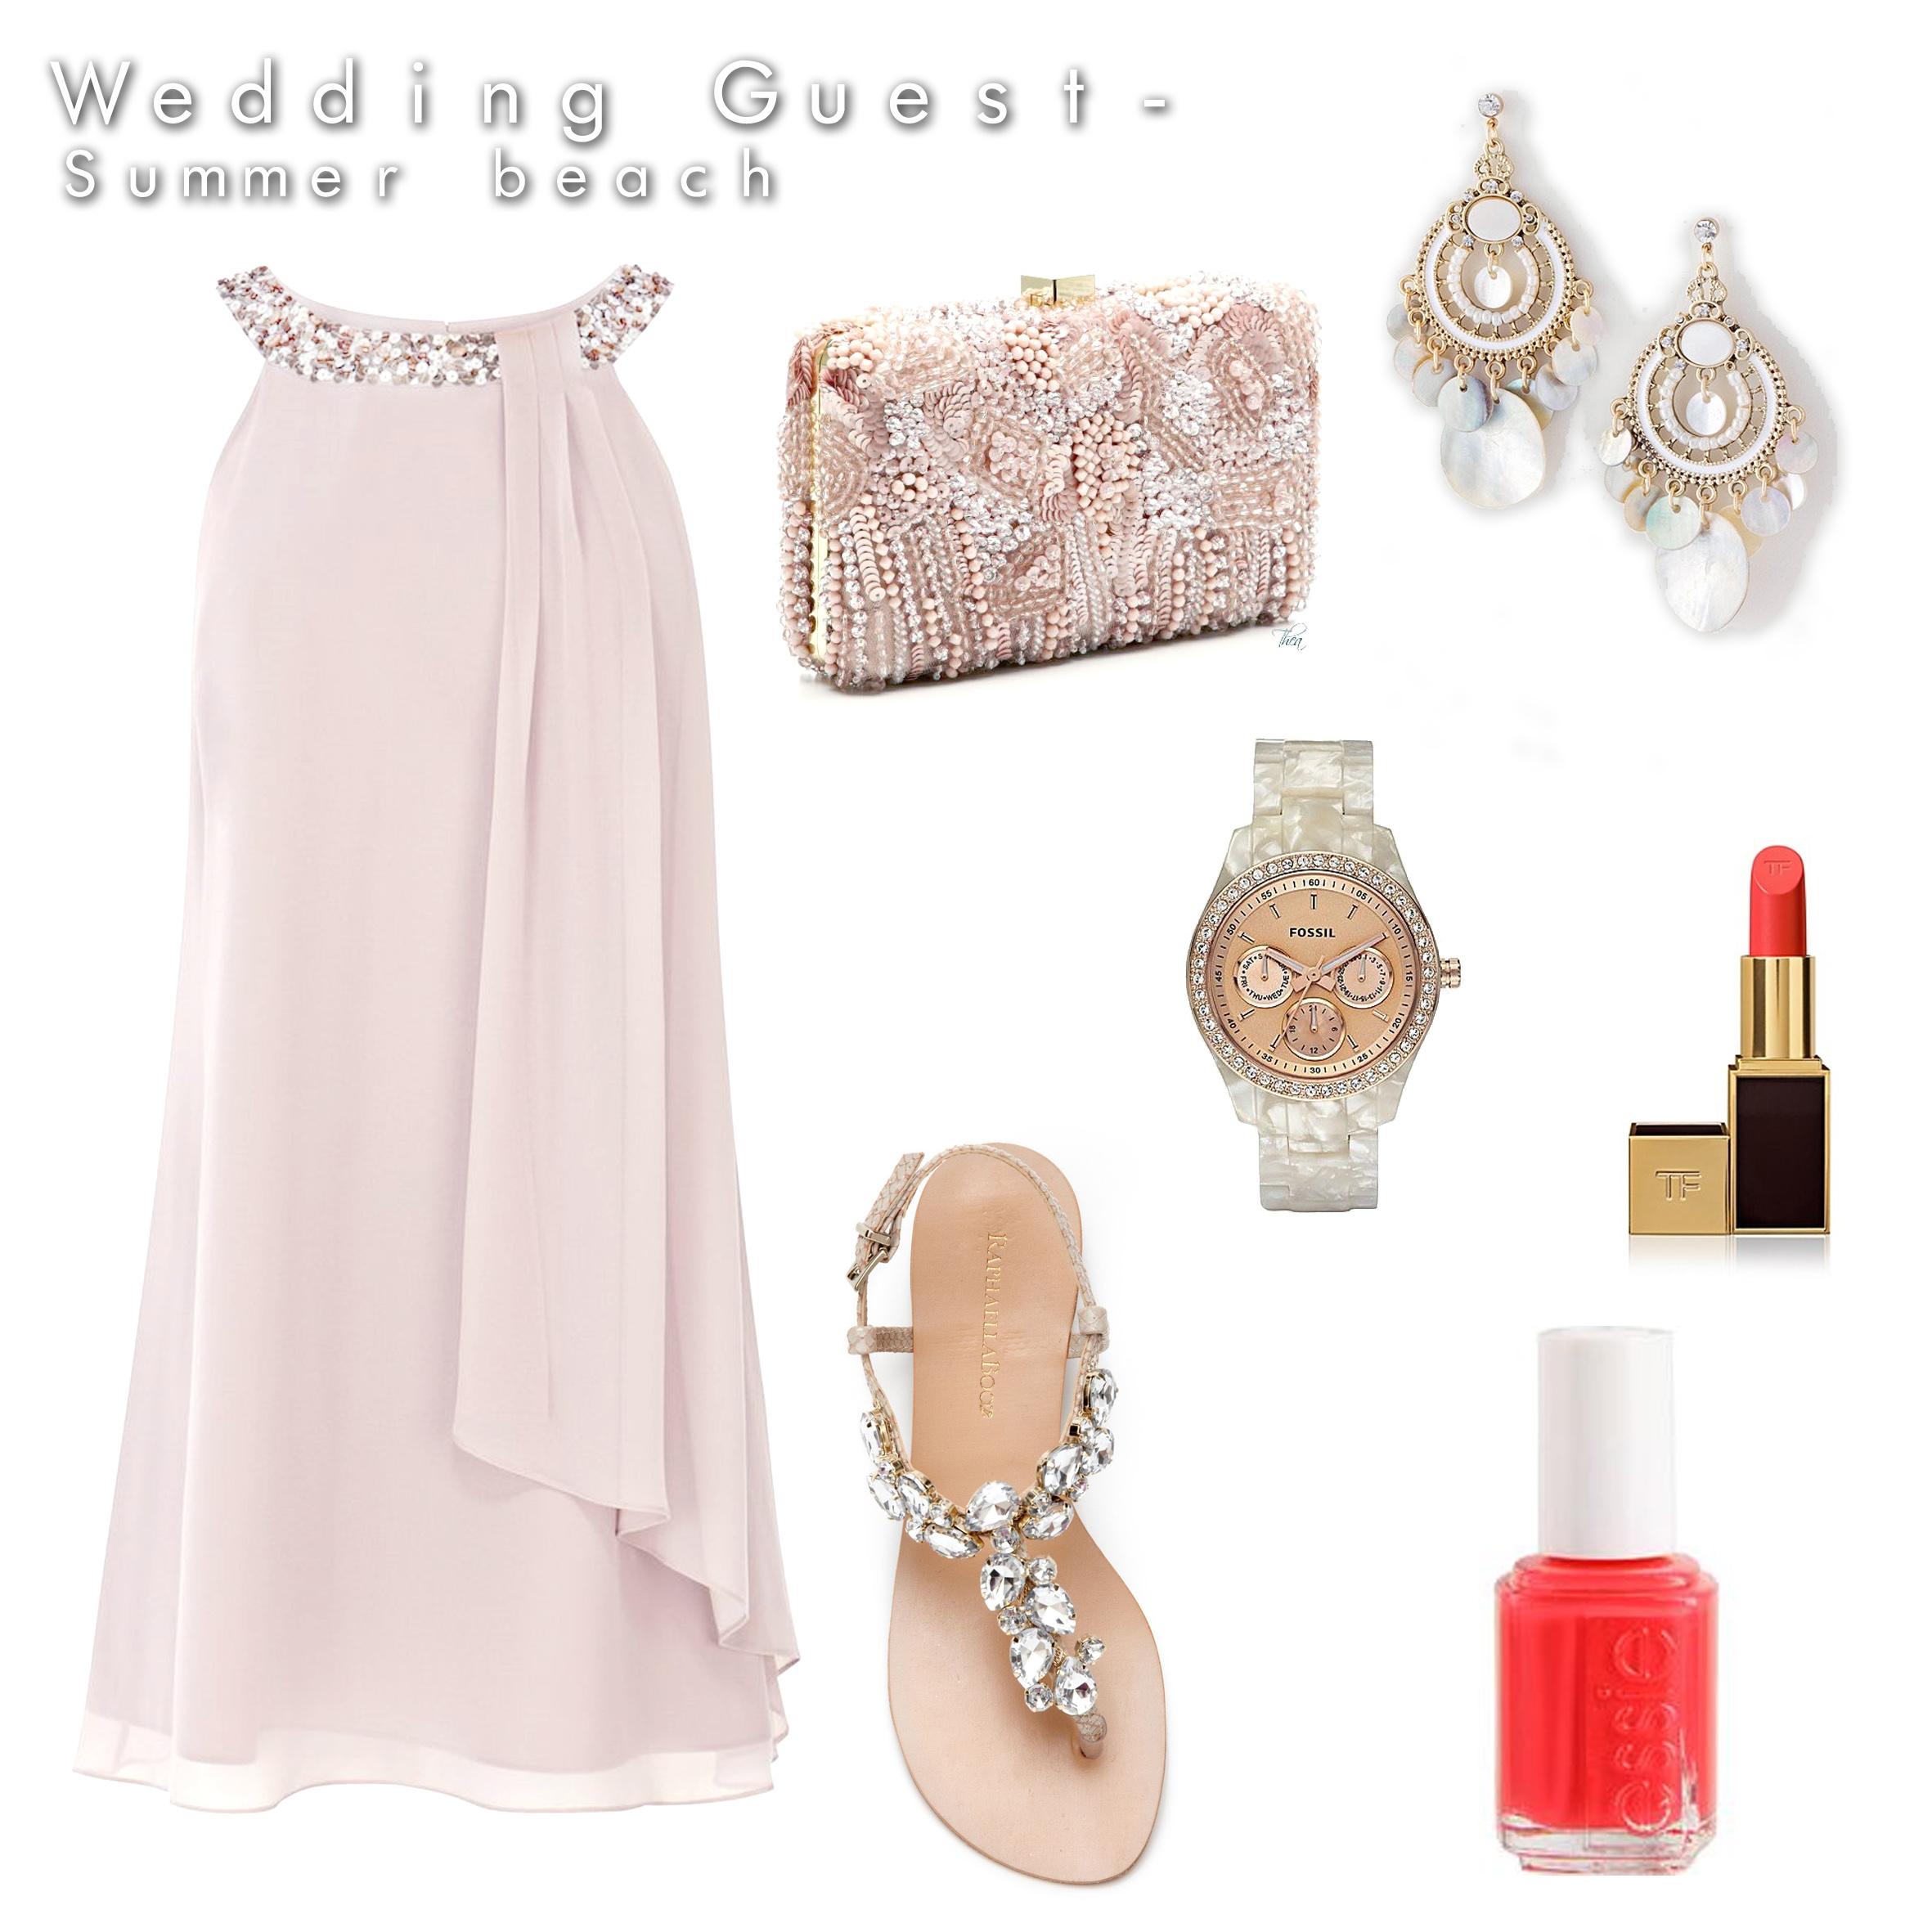 Hanrie Lues Bridal  Evening  Durban Based designer of